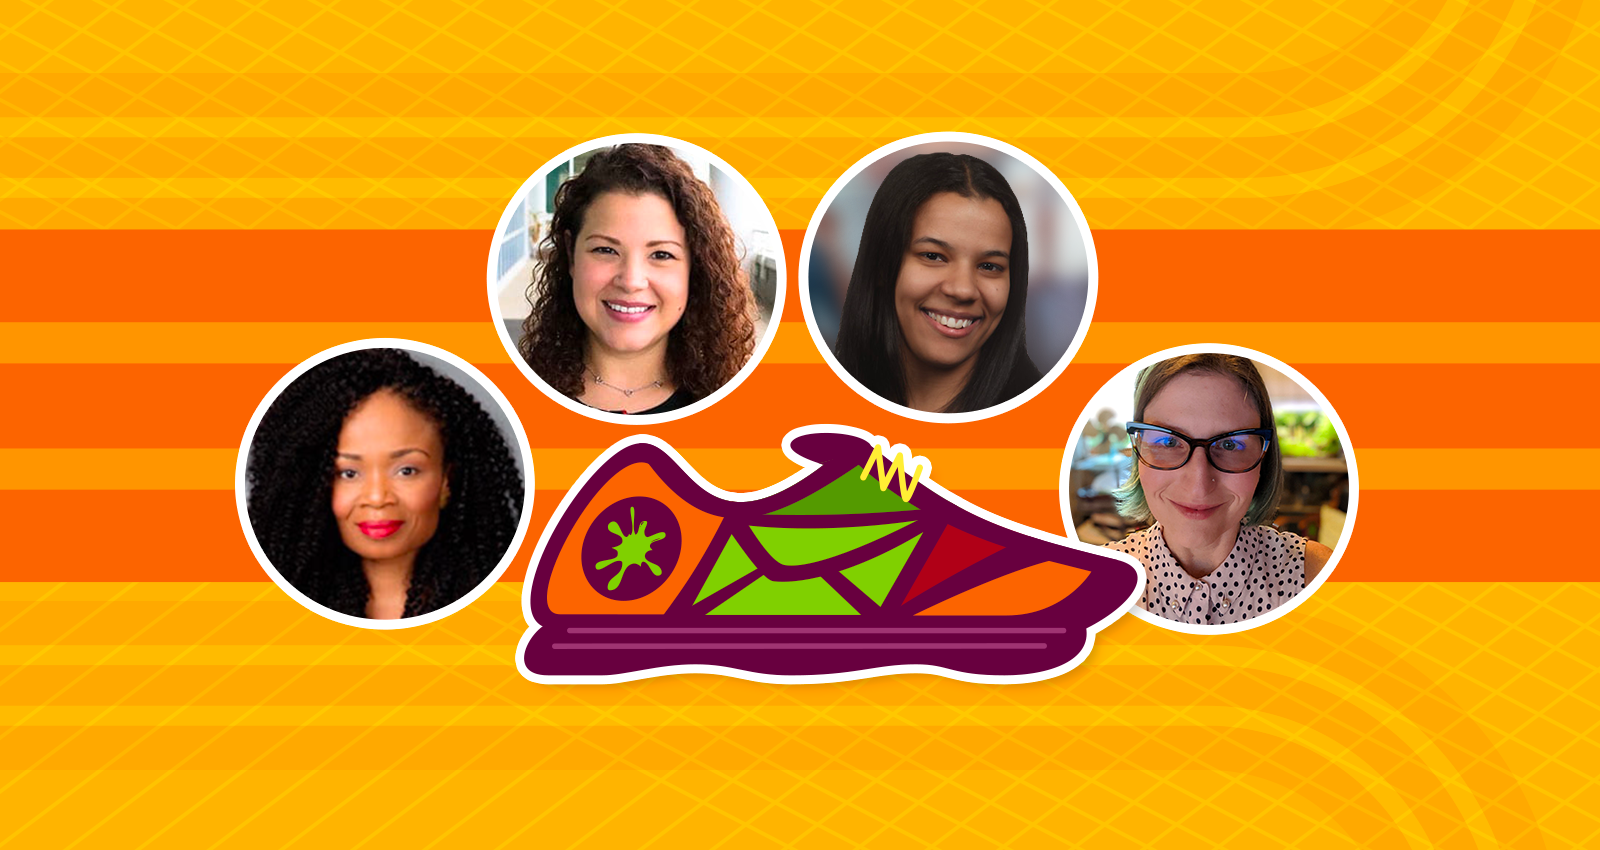 four webinar panelist photos surround shoe icon